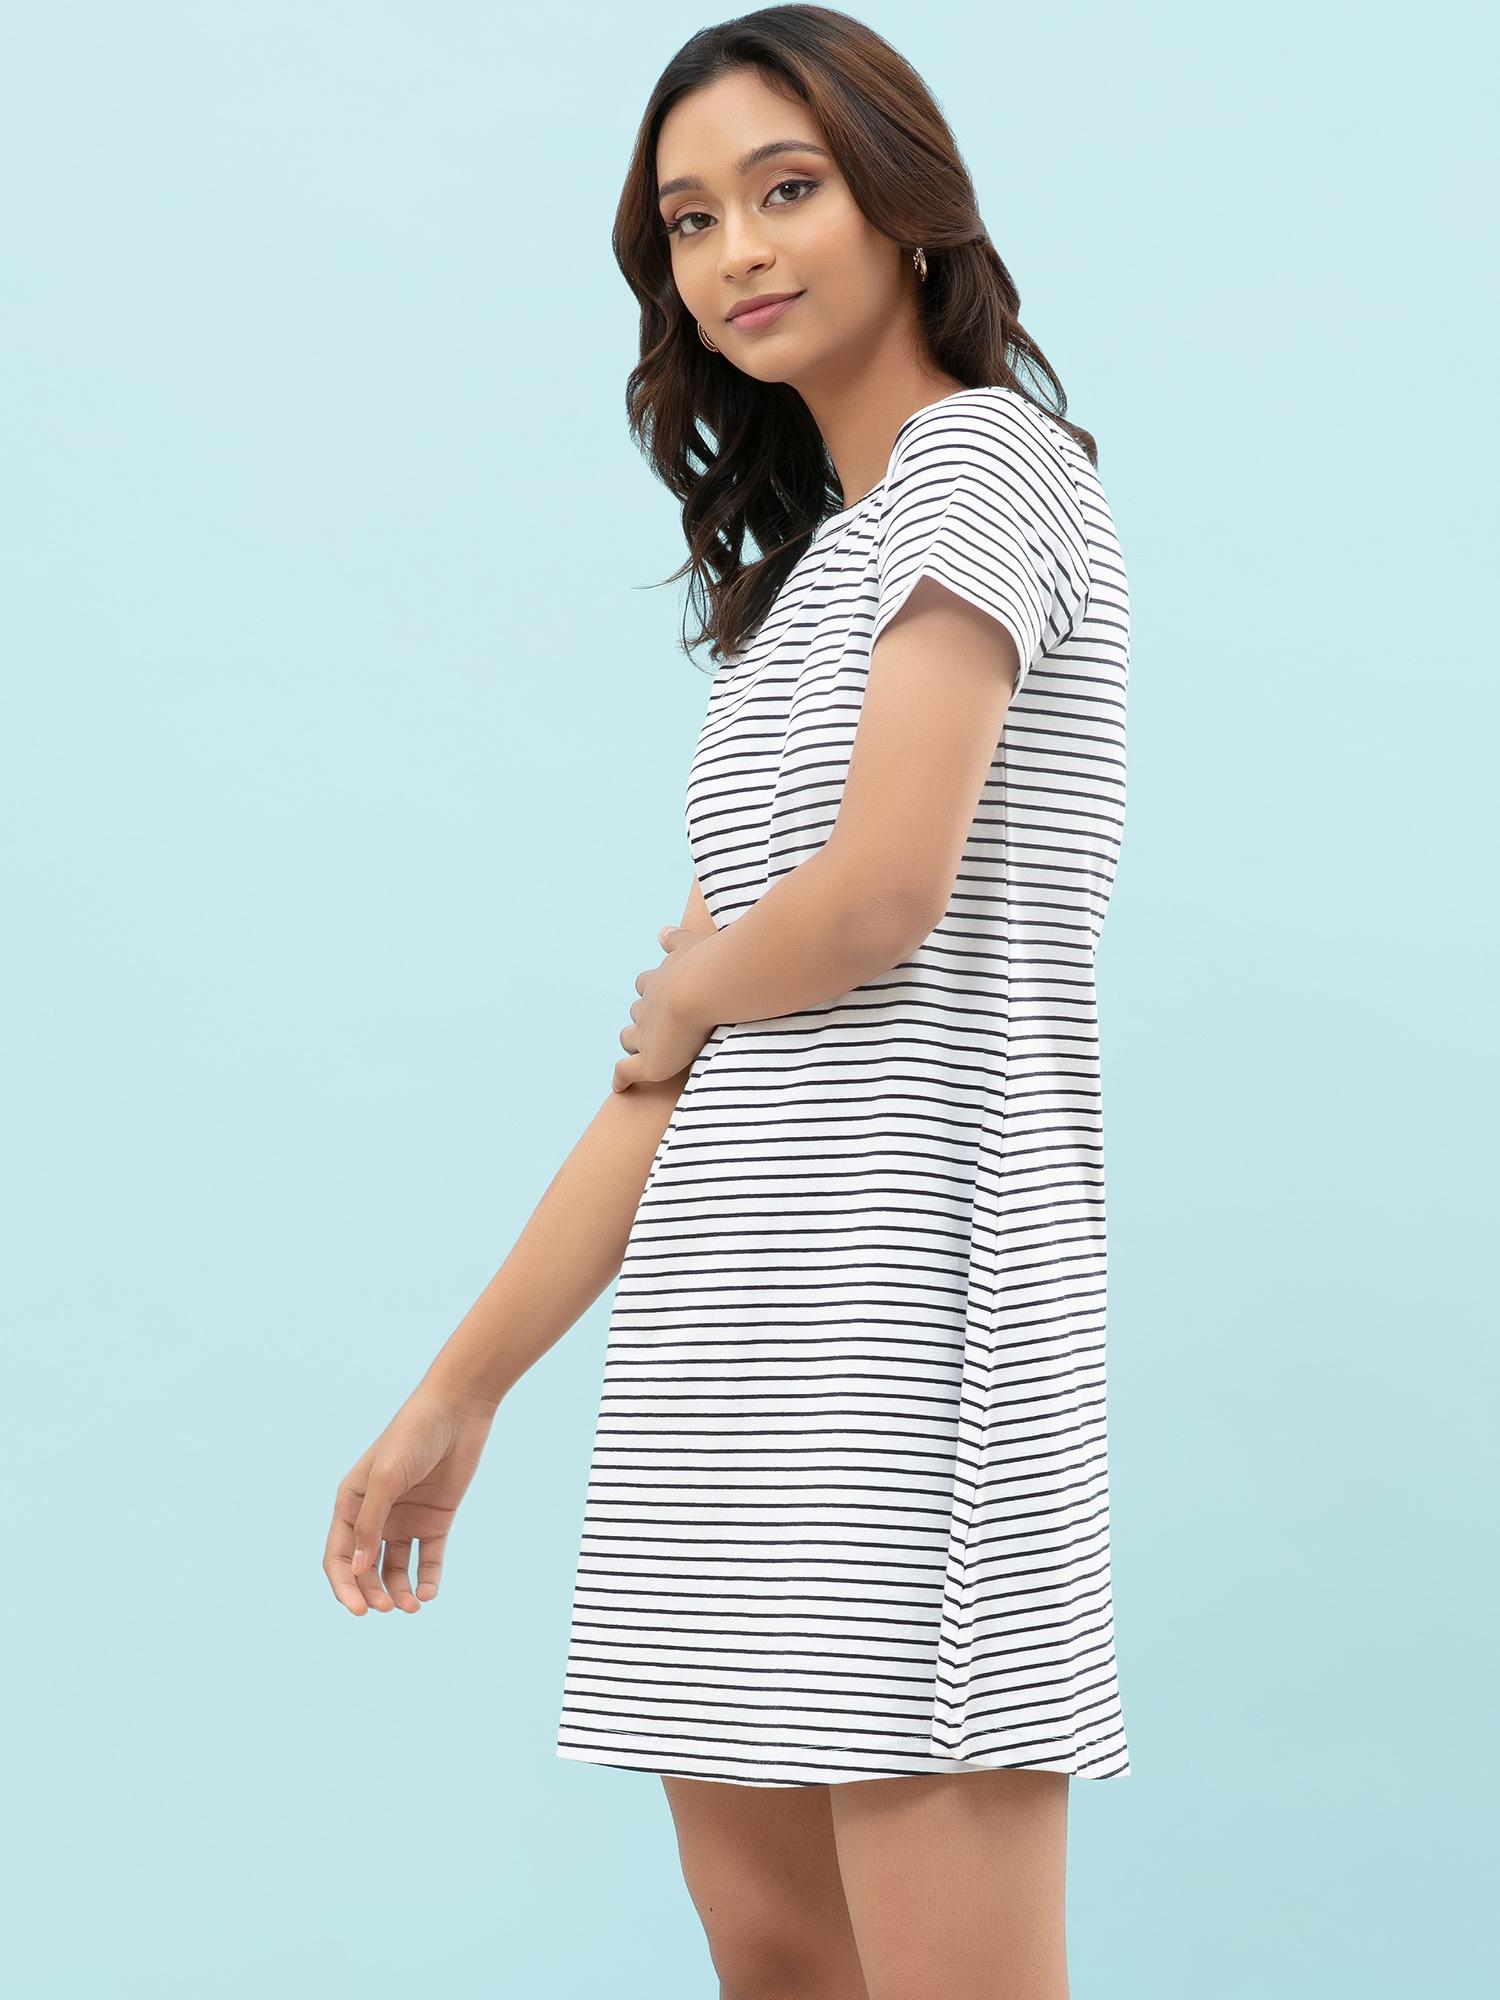 Dresses-On A Line Black Striped Dress4